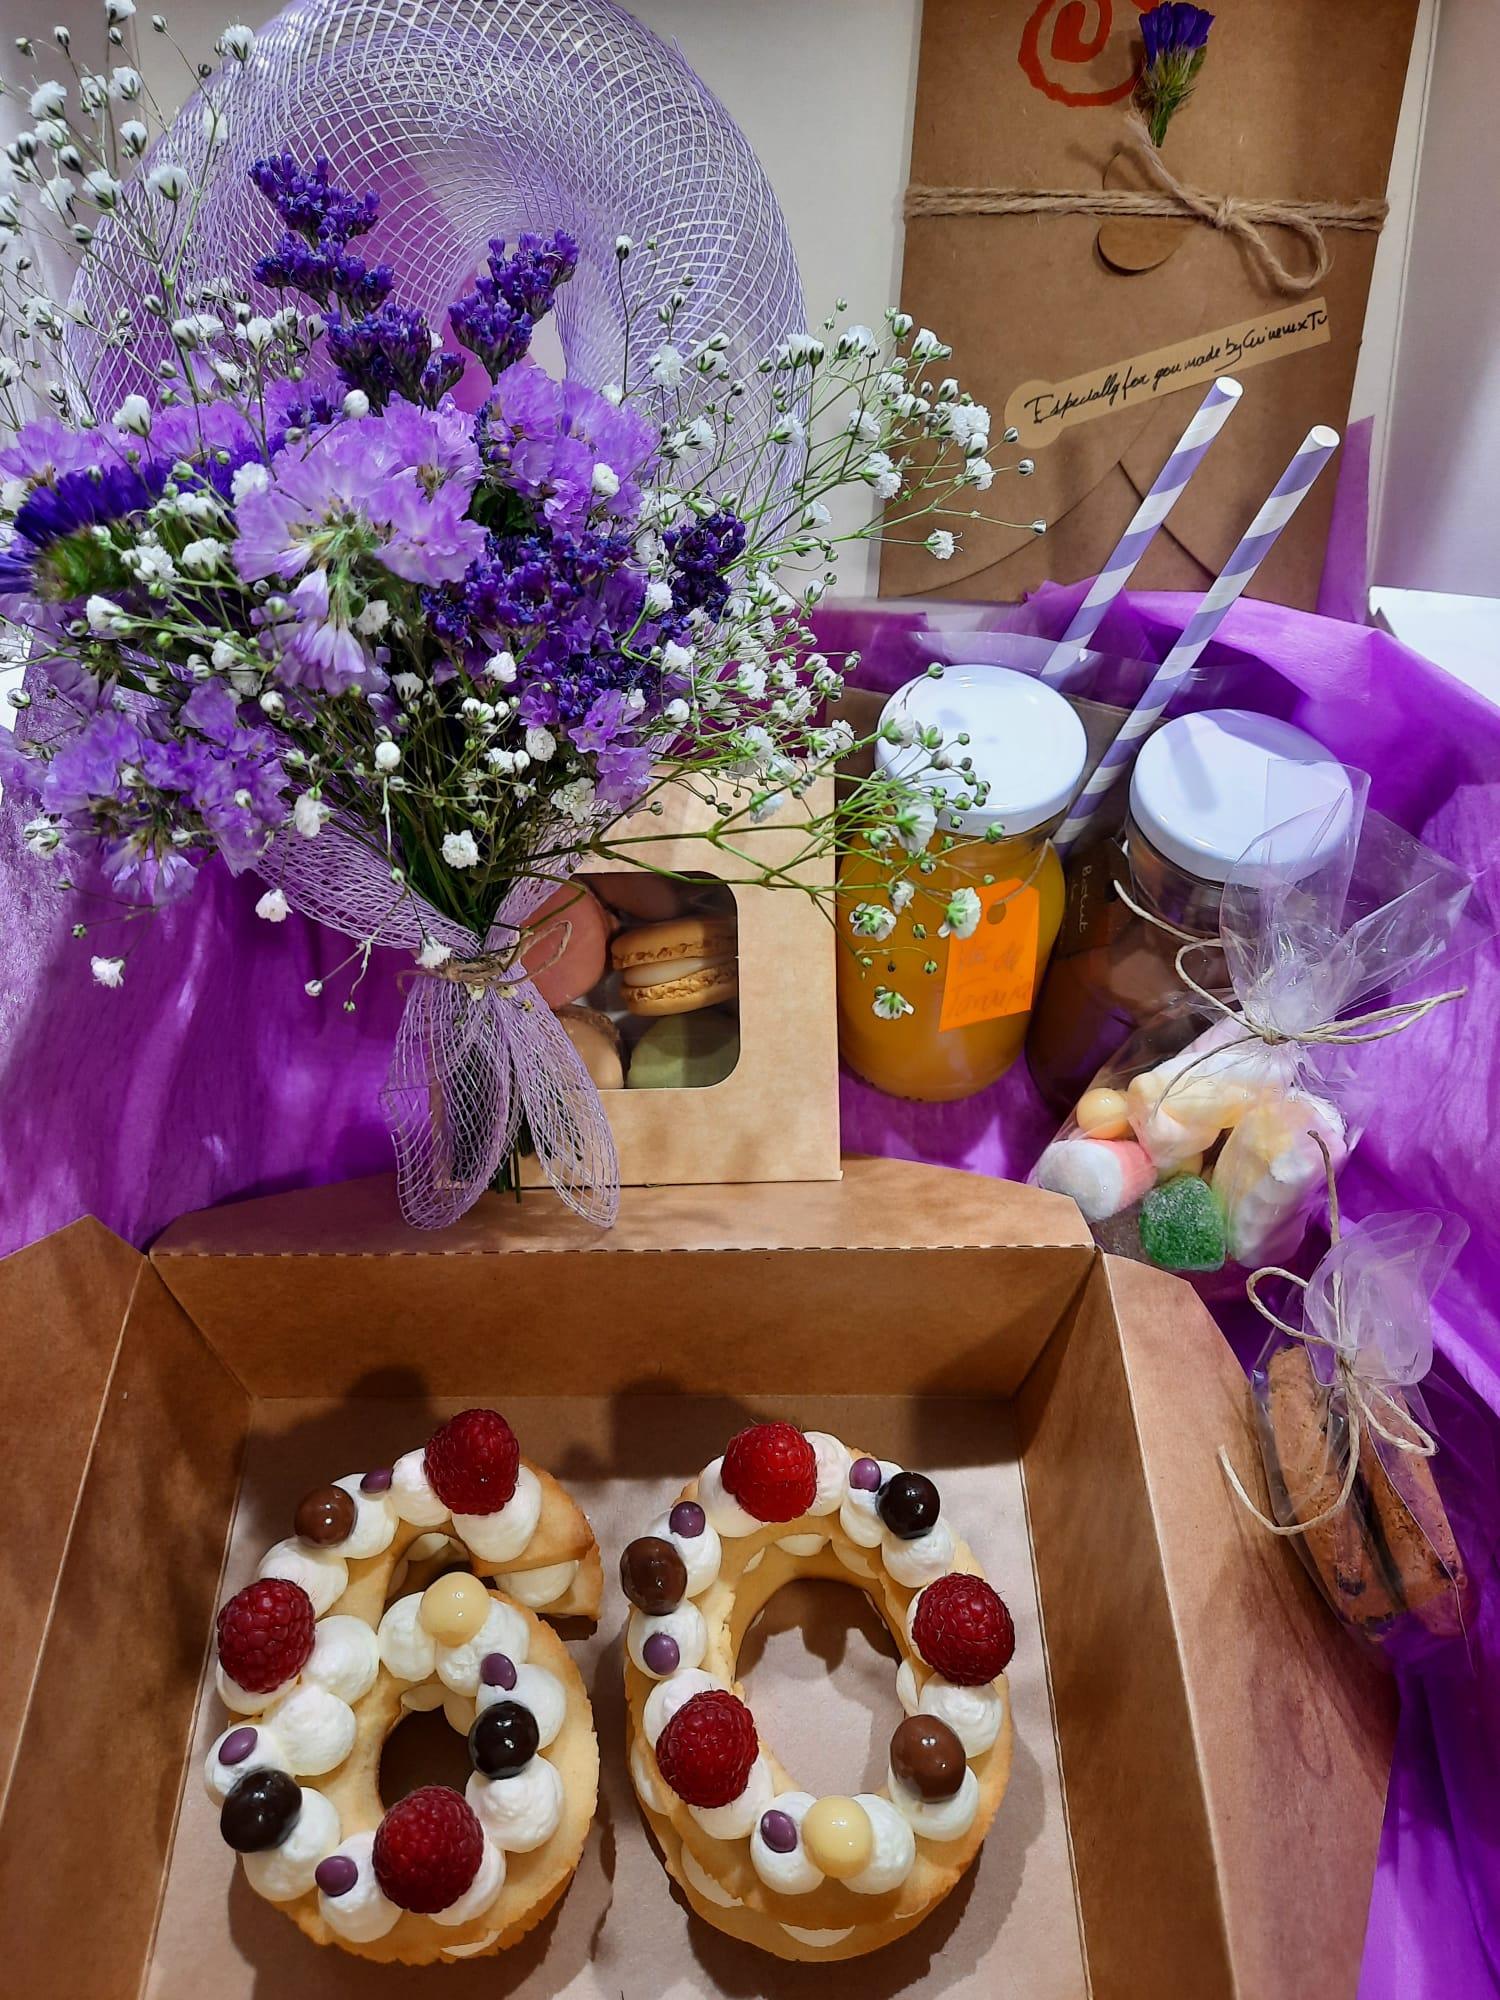 «El millor esmorzar de la meva vida! Moltíssimes gràcies!» Raquel (Sabadell)